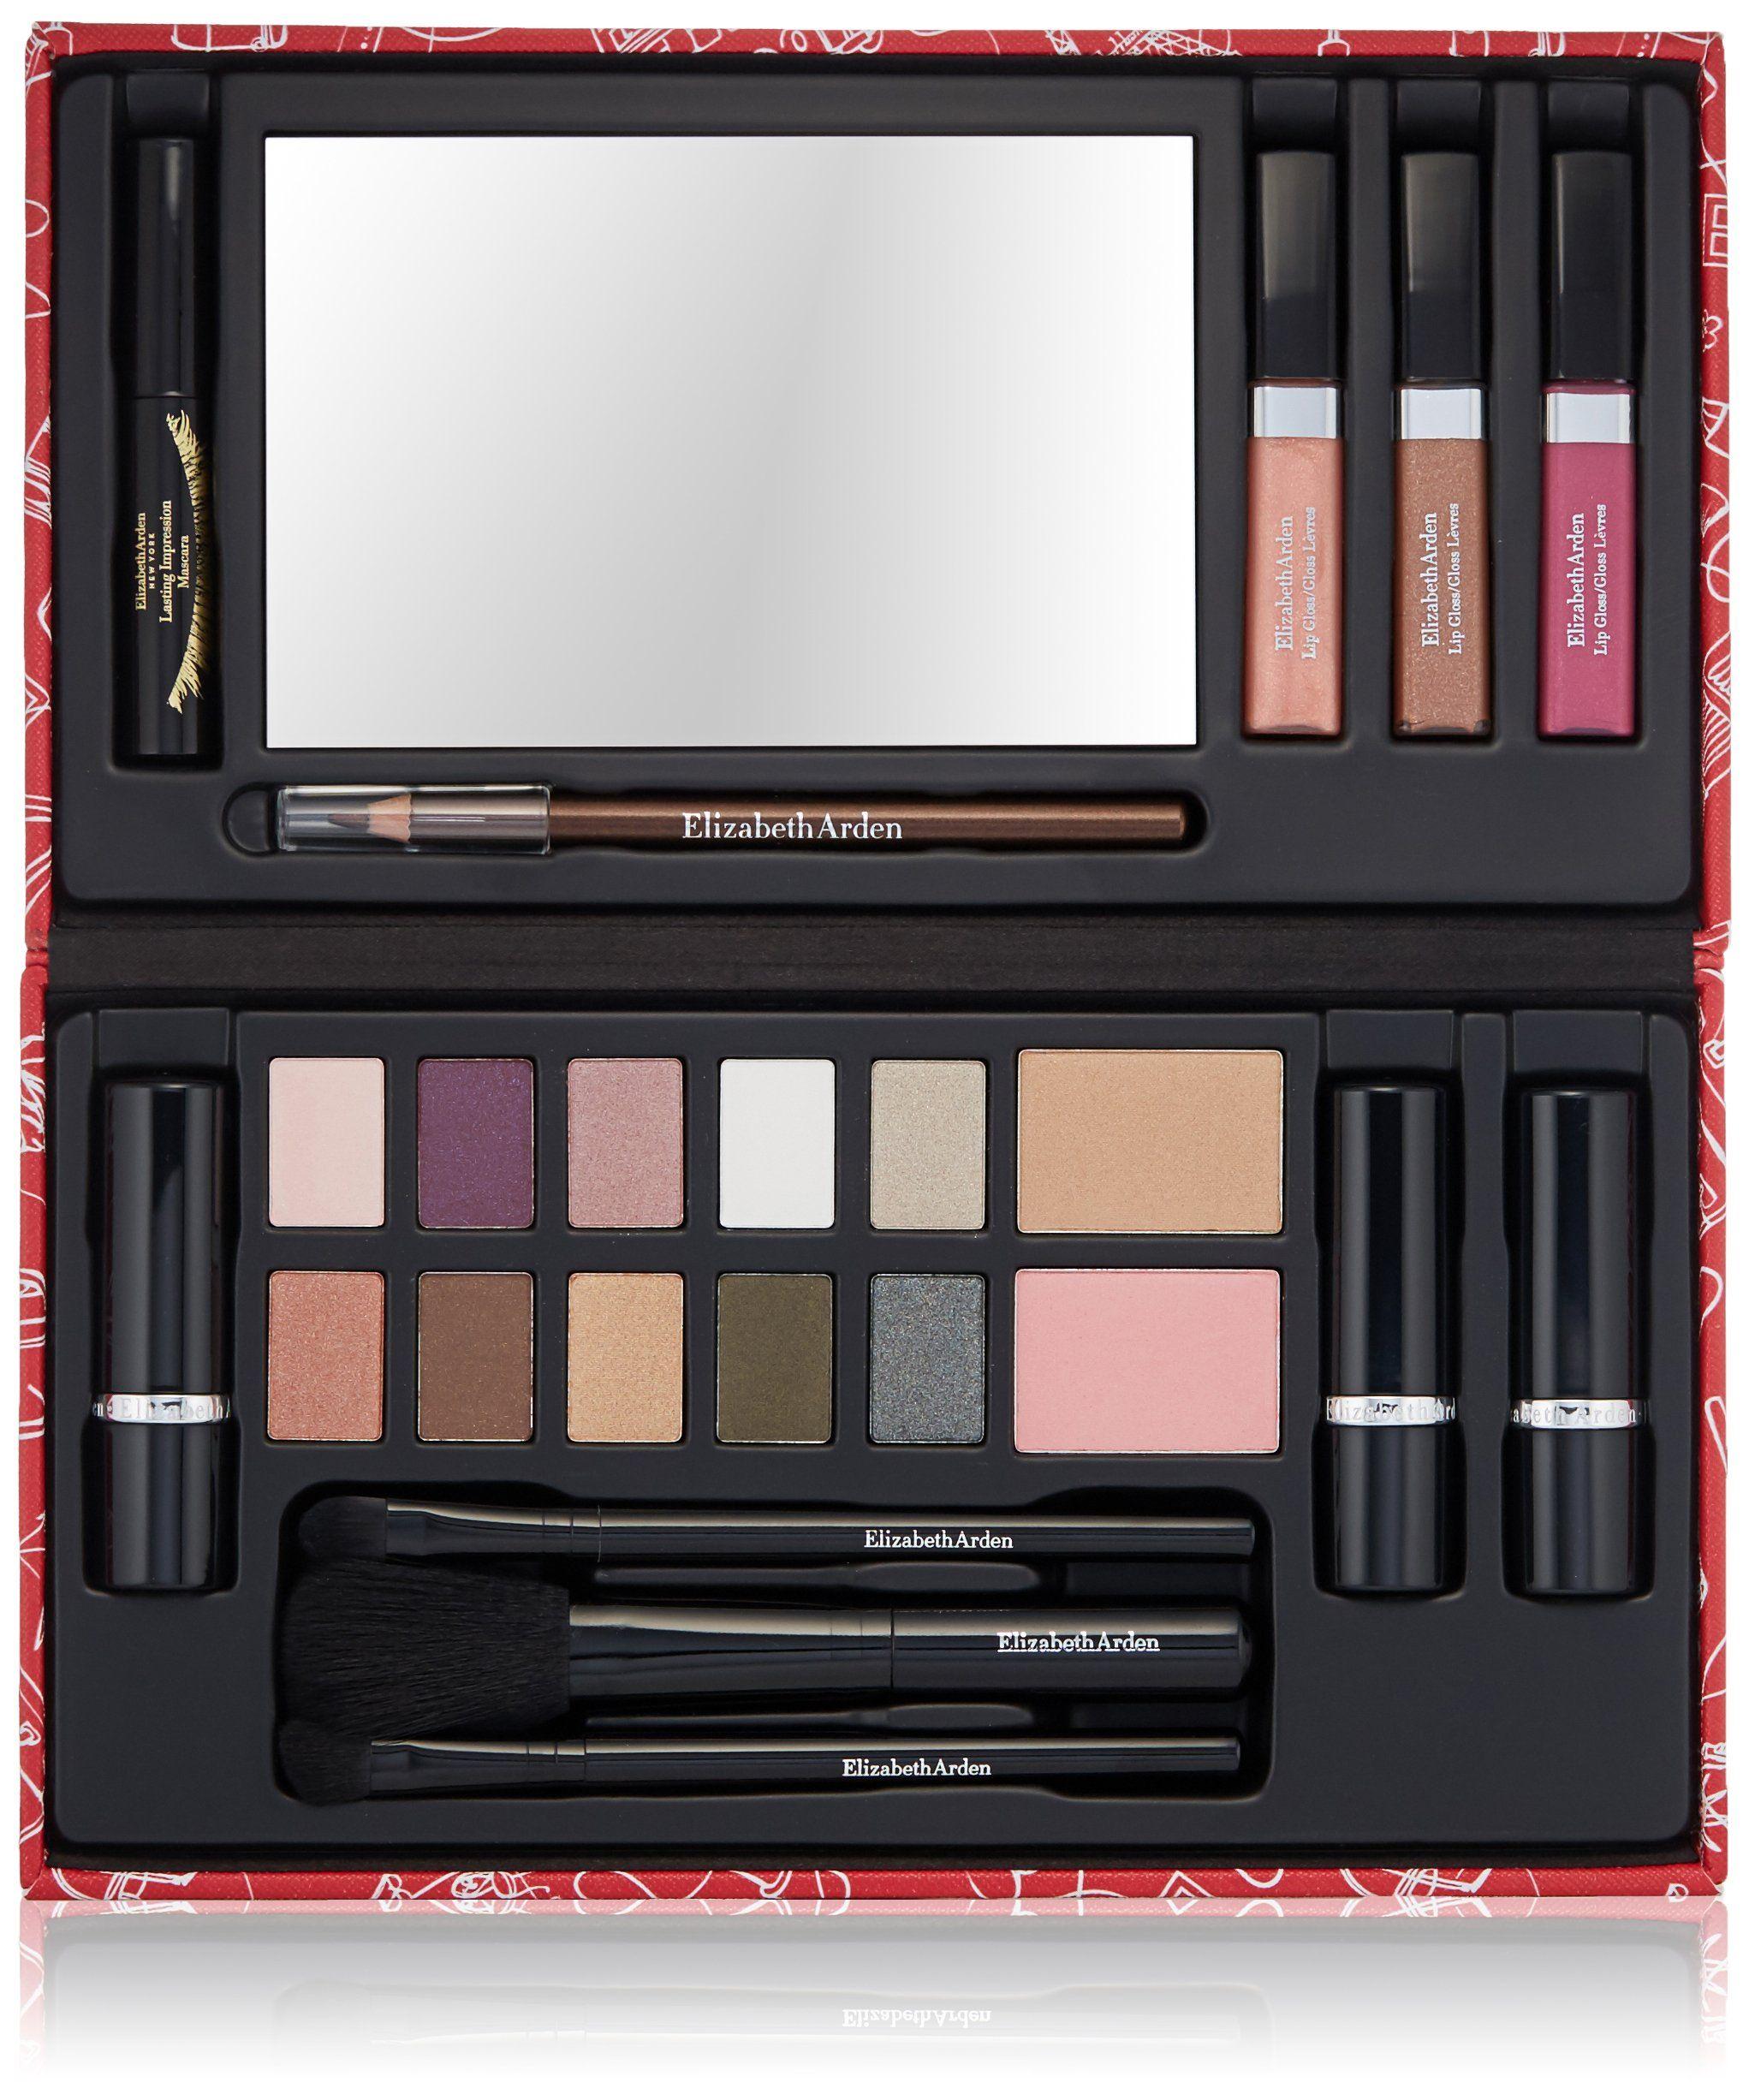 elizabeth arden makeup - HD2043×2453